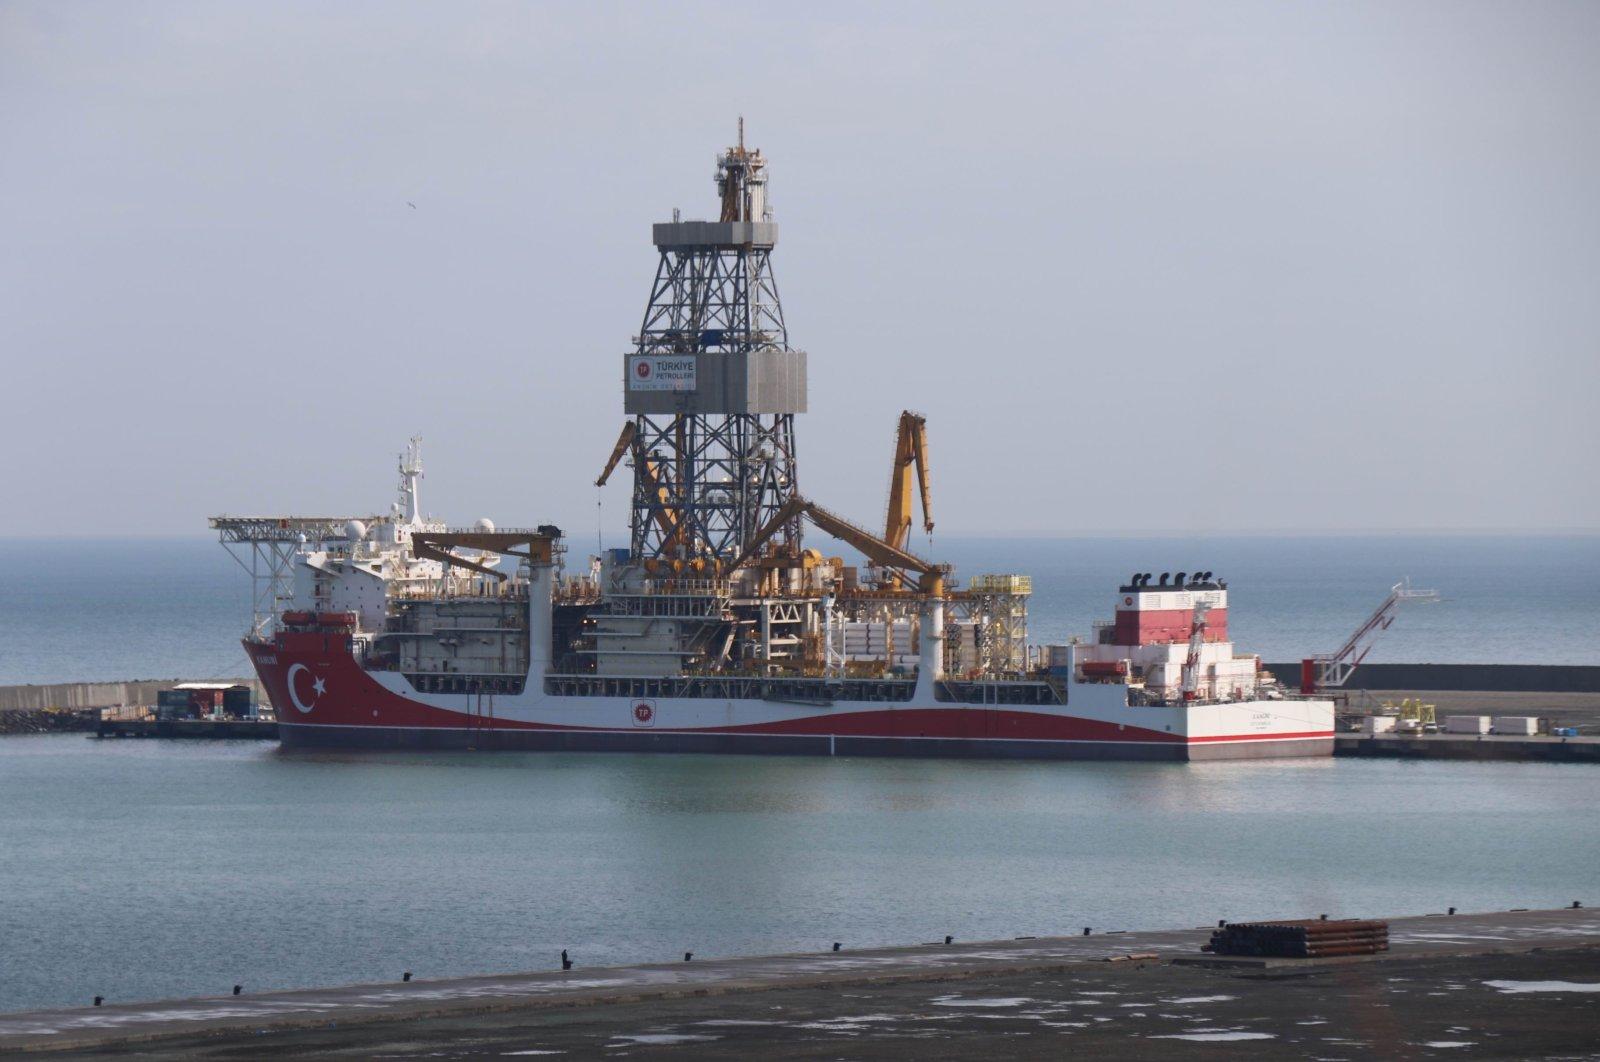 The Kanuni drillship is seen at the Port of Filyos in northern Zonguldak province, Turkey, Feb. 6, 2021. (IHA Photo)